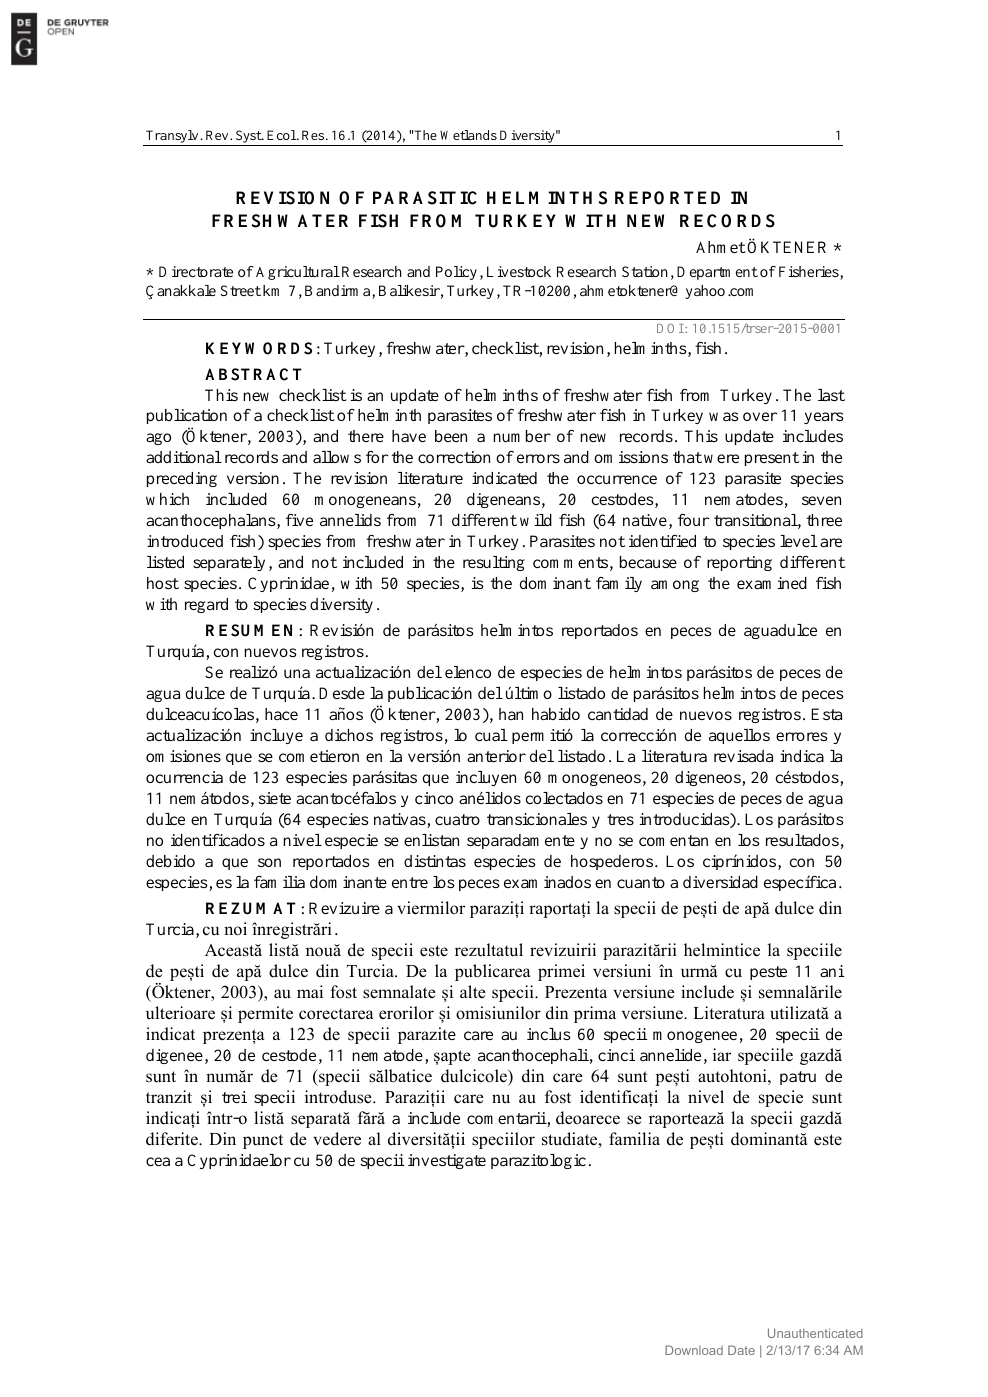 specii de cestoda platyhelminthes)